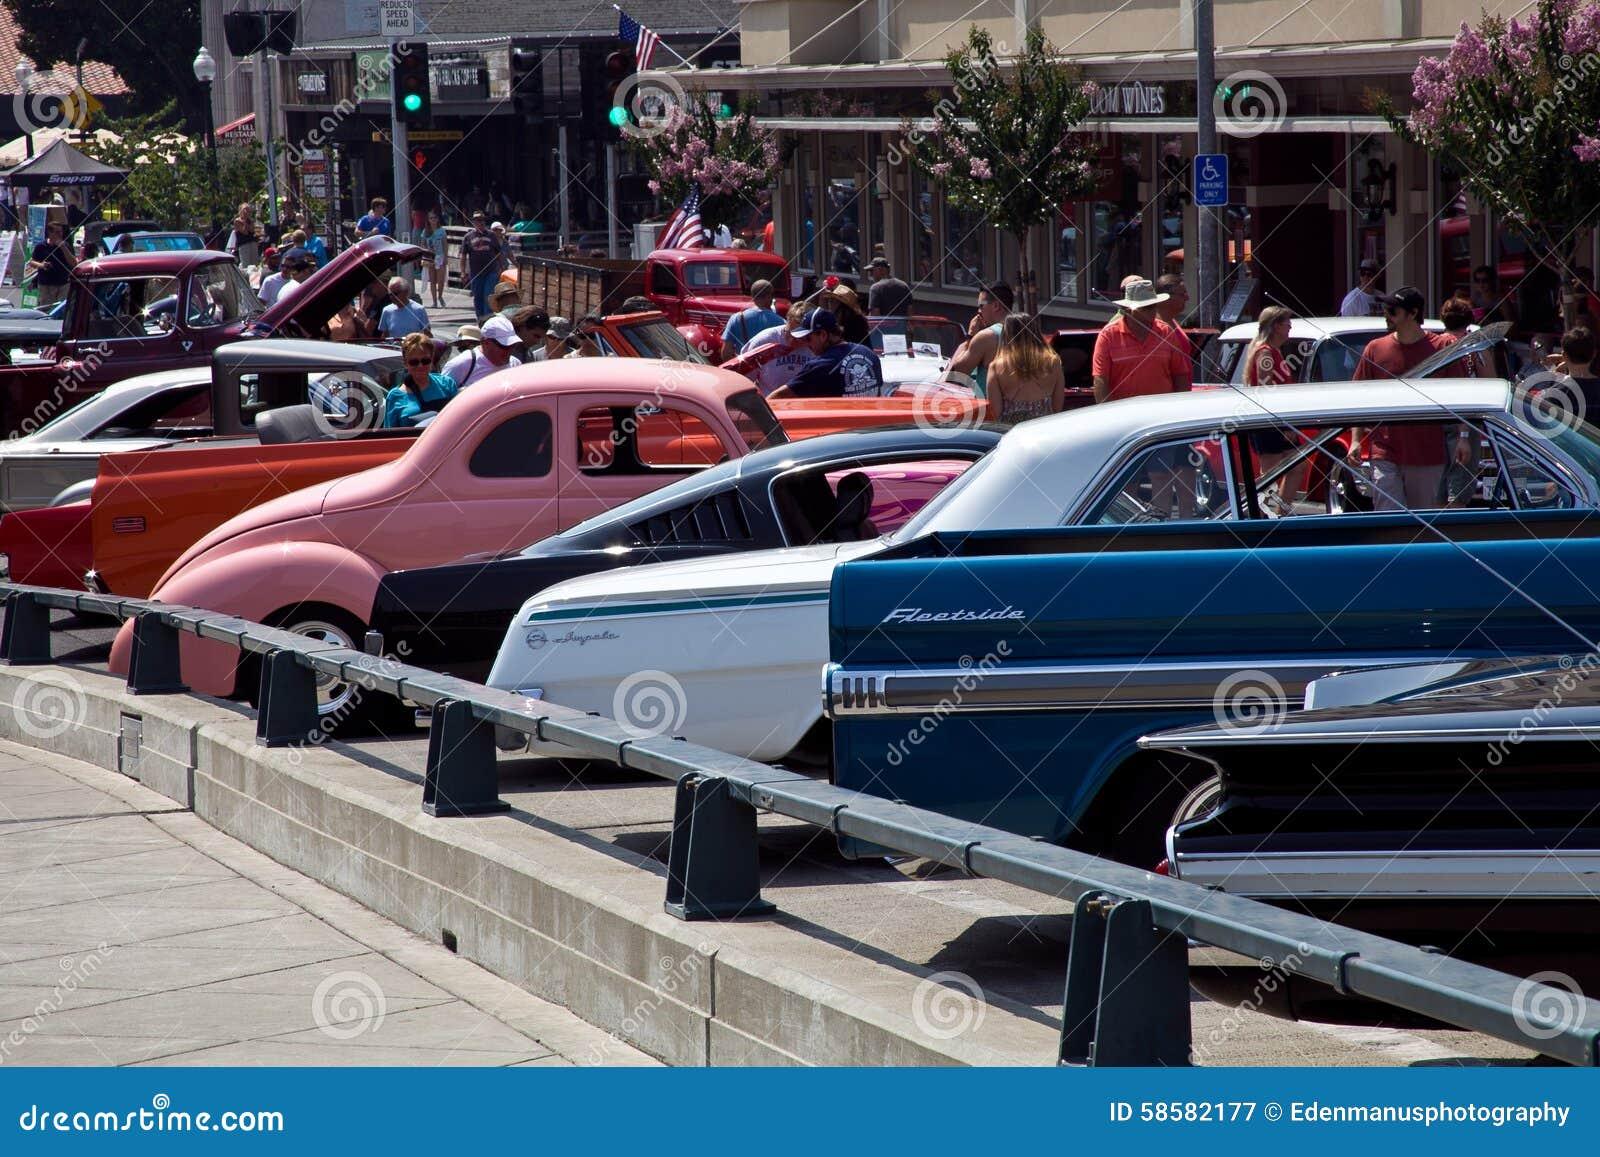 Napa Main St Reunion Car Show Editorial Photography Image Of - Main street car show